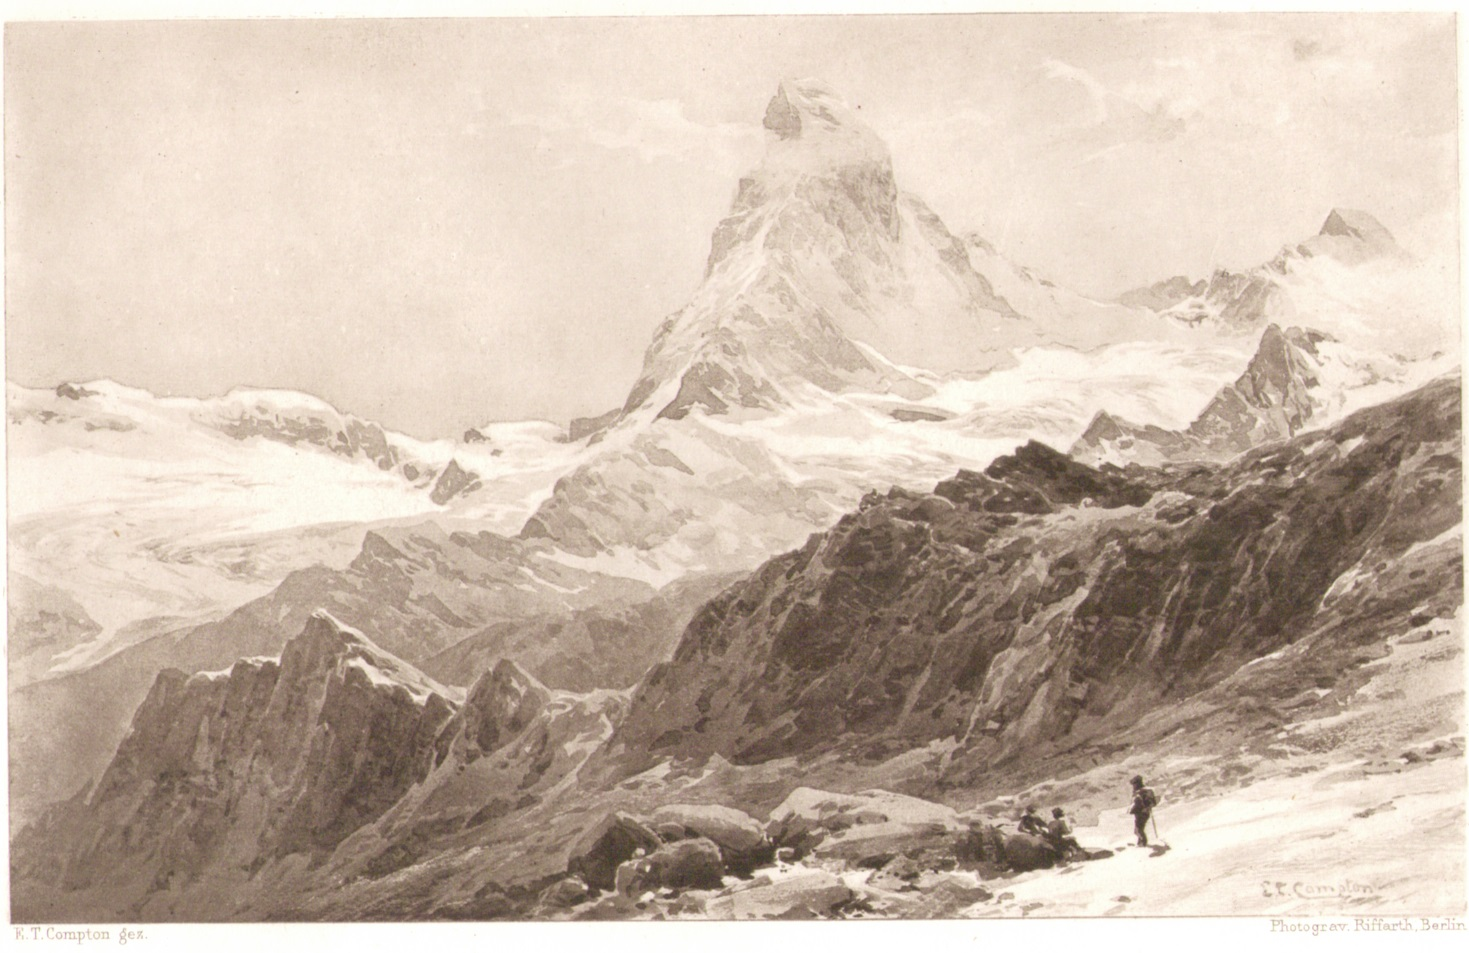 Edward Theodore Compton - Matterhorn 1889p.jpg